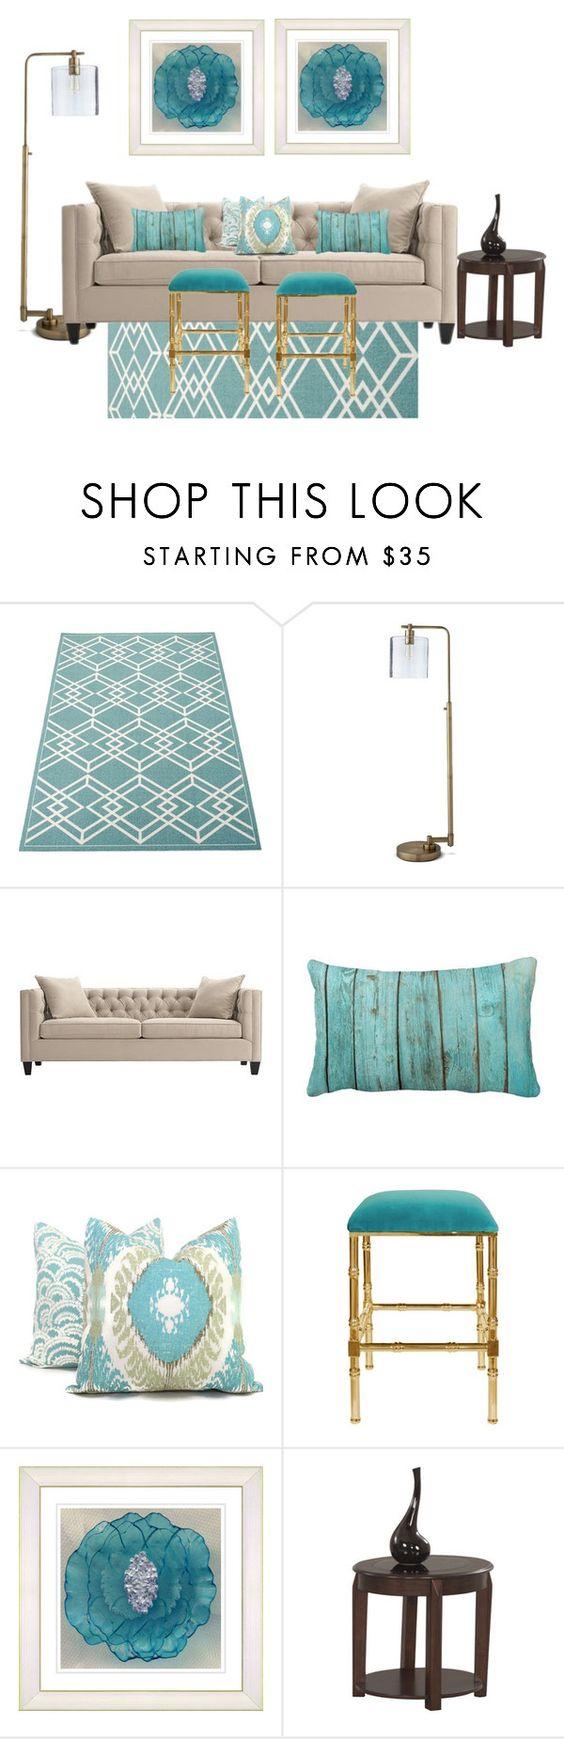 Threshold home decor shop for threshold home decor on polyvore -  Terrific Turquoise By Rjackson On Polyvore Featuring Interior Interiors Interior Design